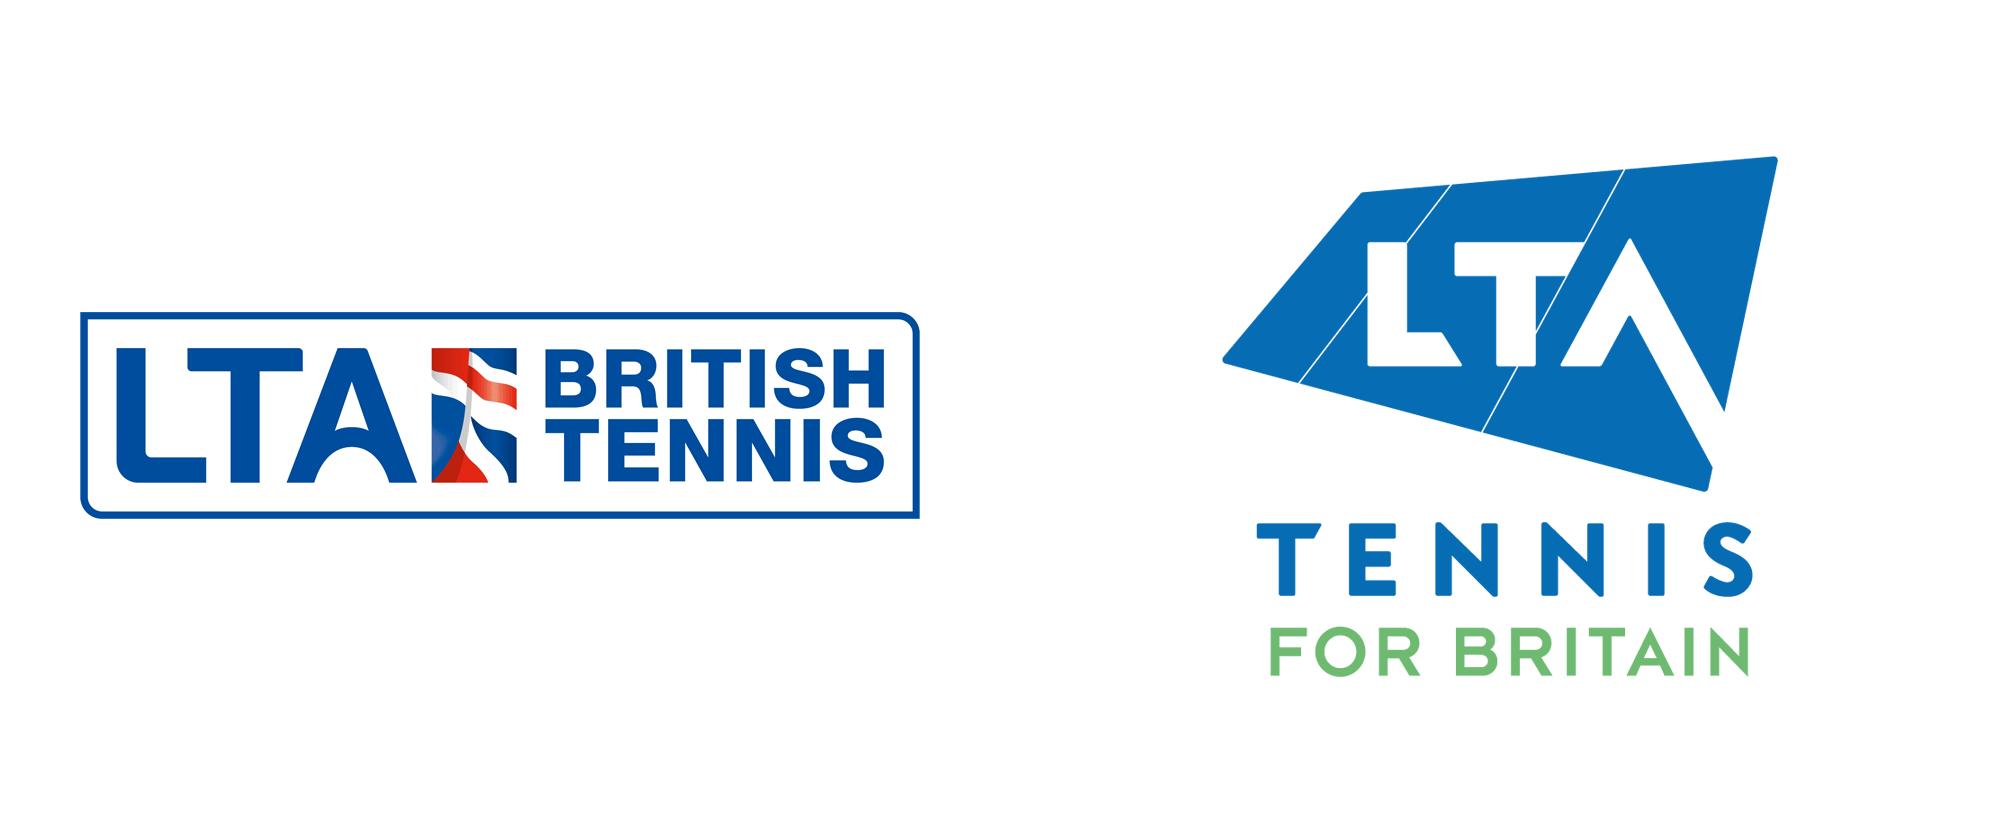 New Logo for Lawn Tennis Association